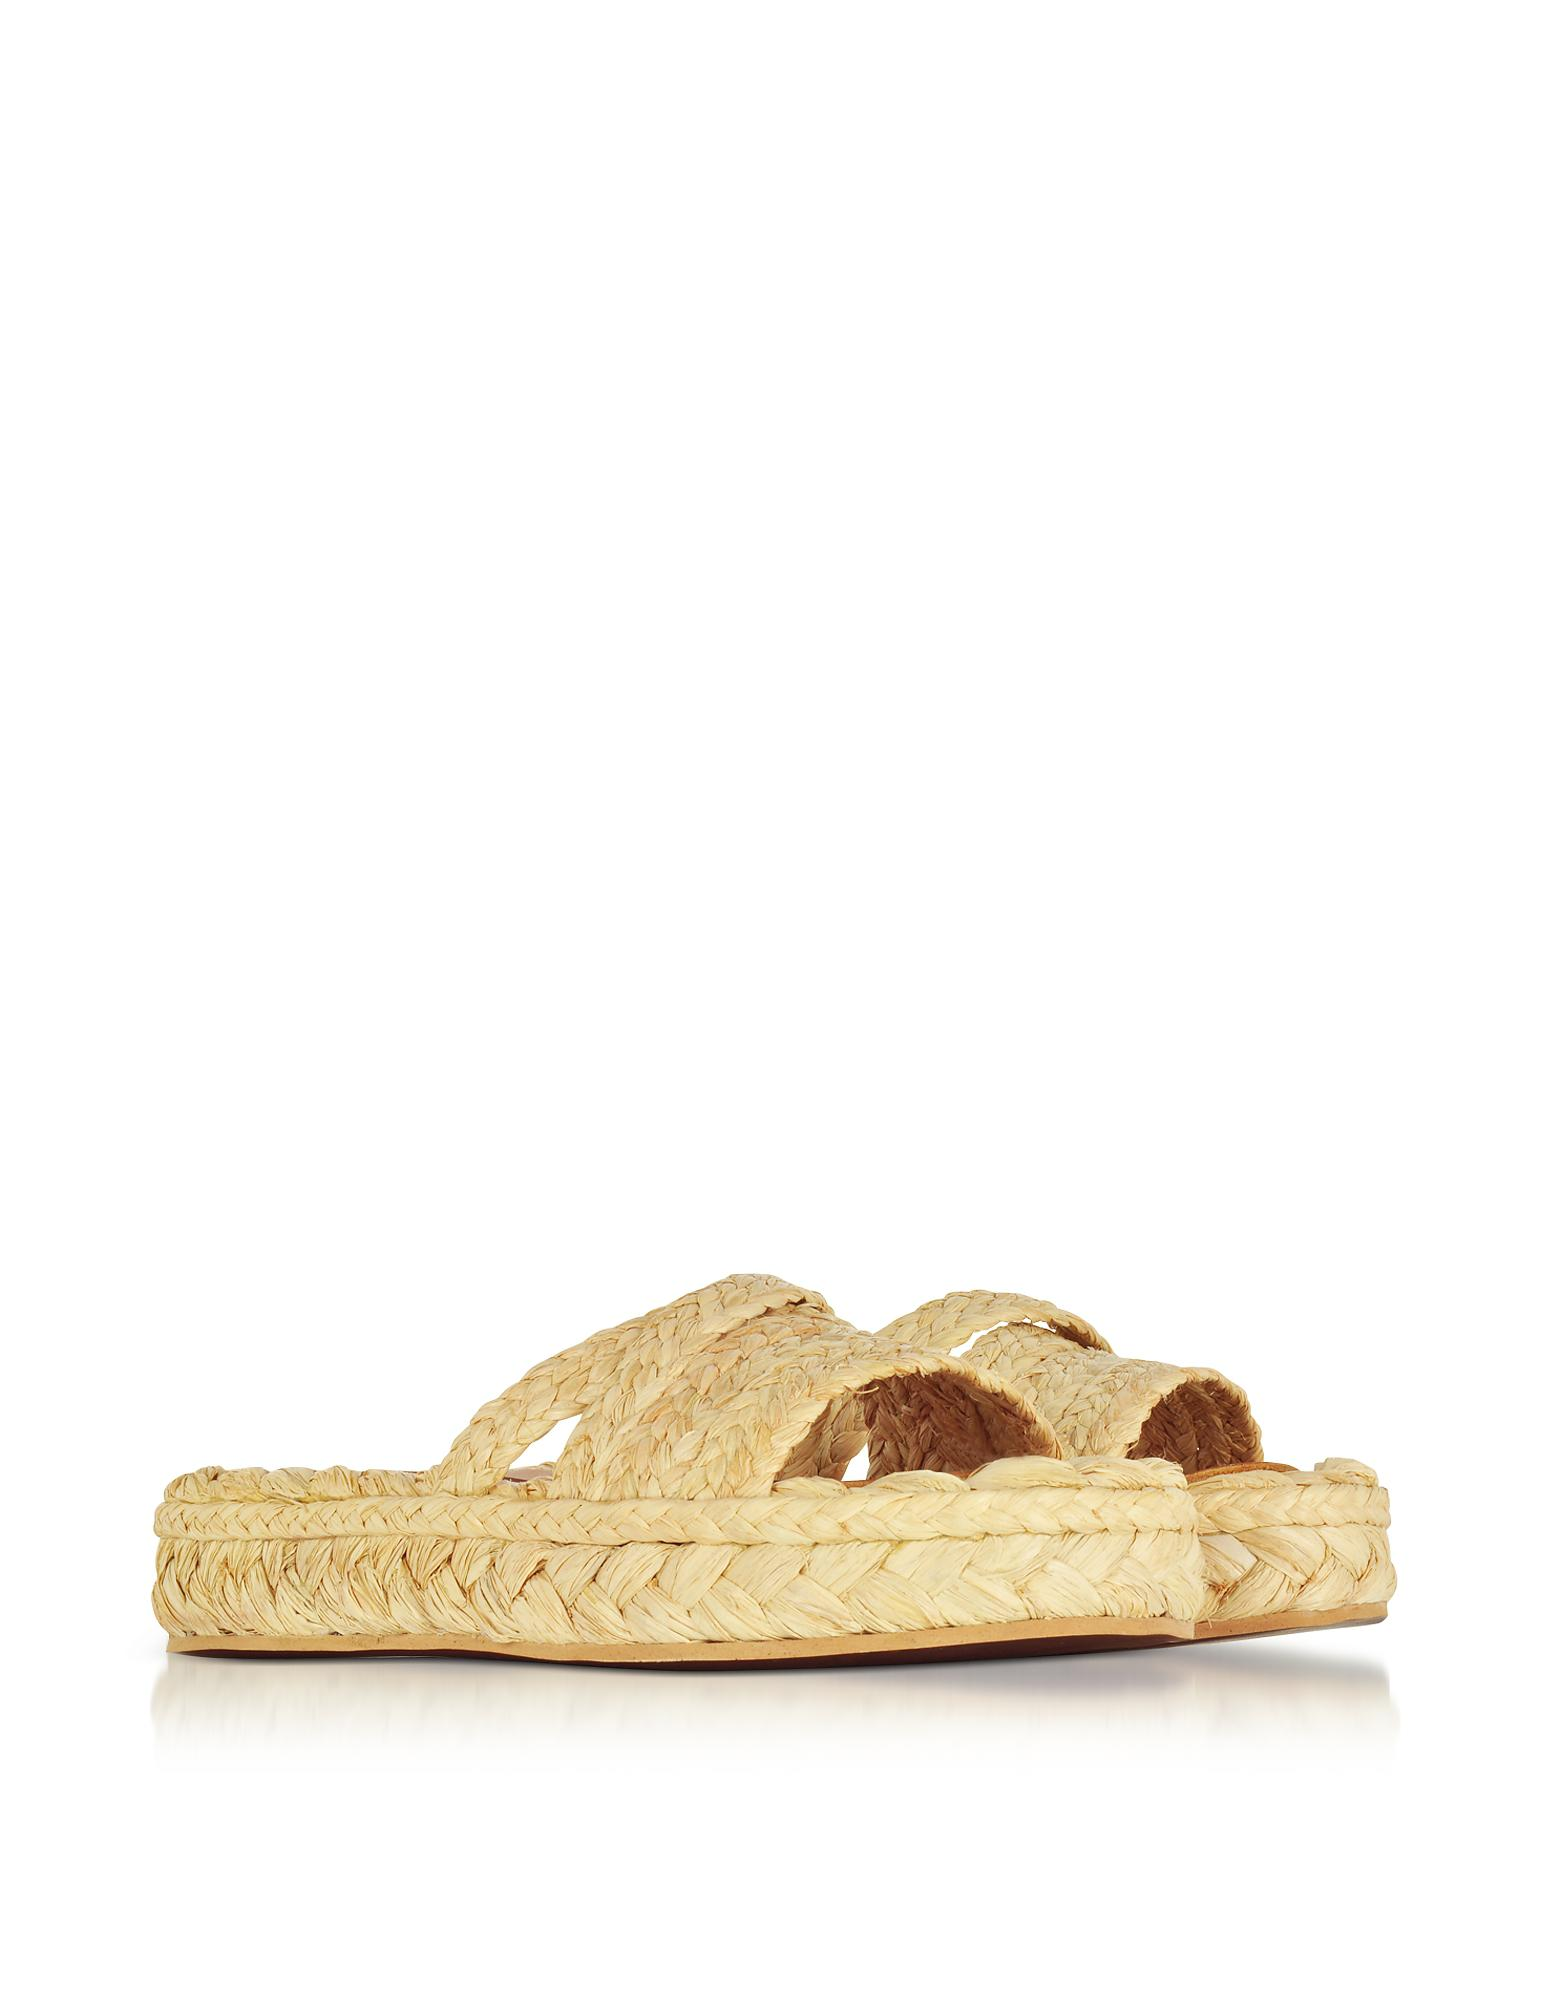 3471da7fd842 Lyst - Robert Clergerie Idalie Natural Braided Raffia Flat Sandals ...